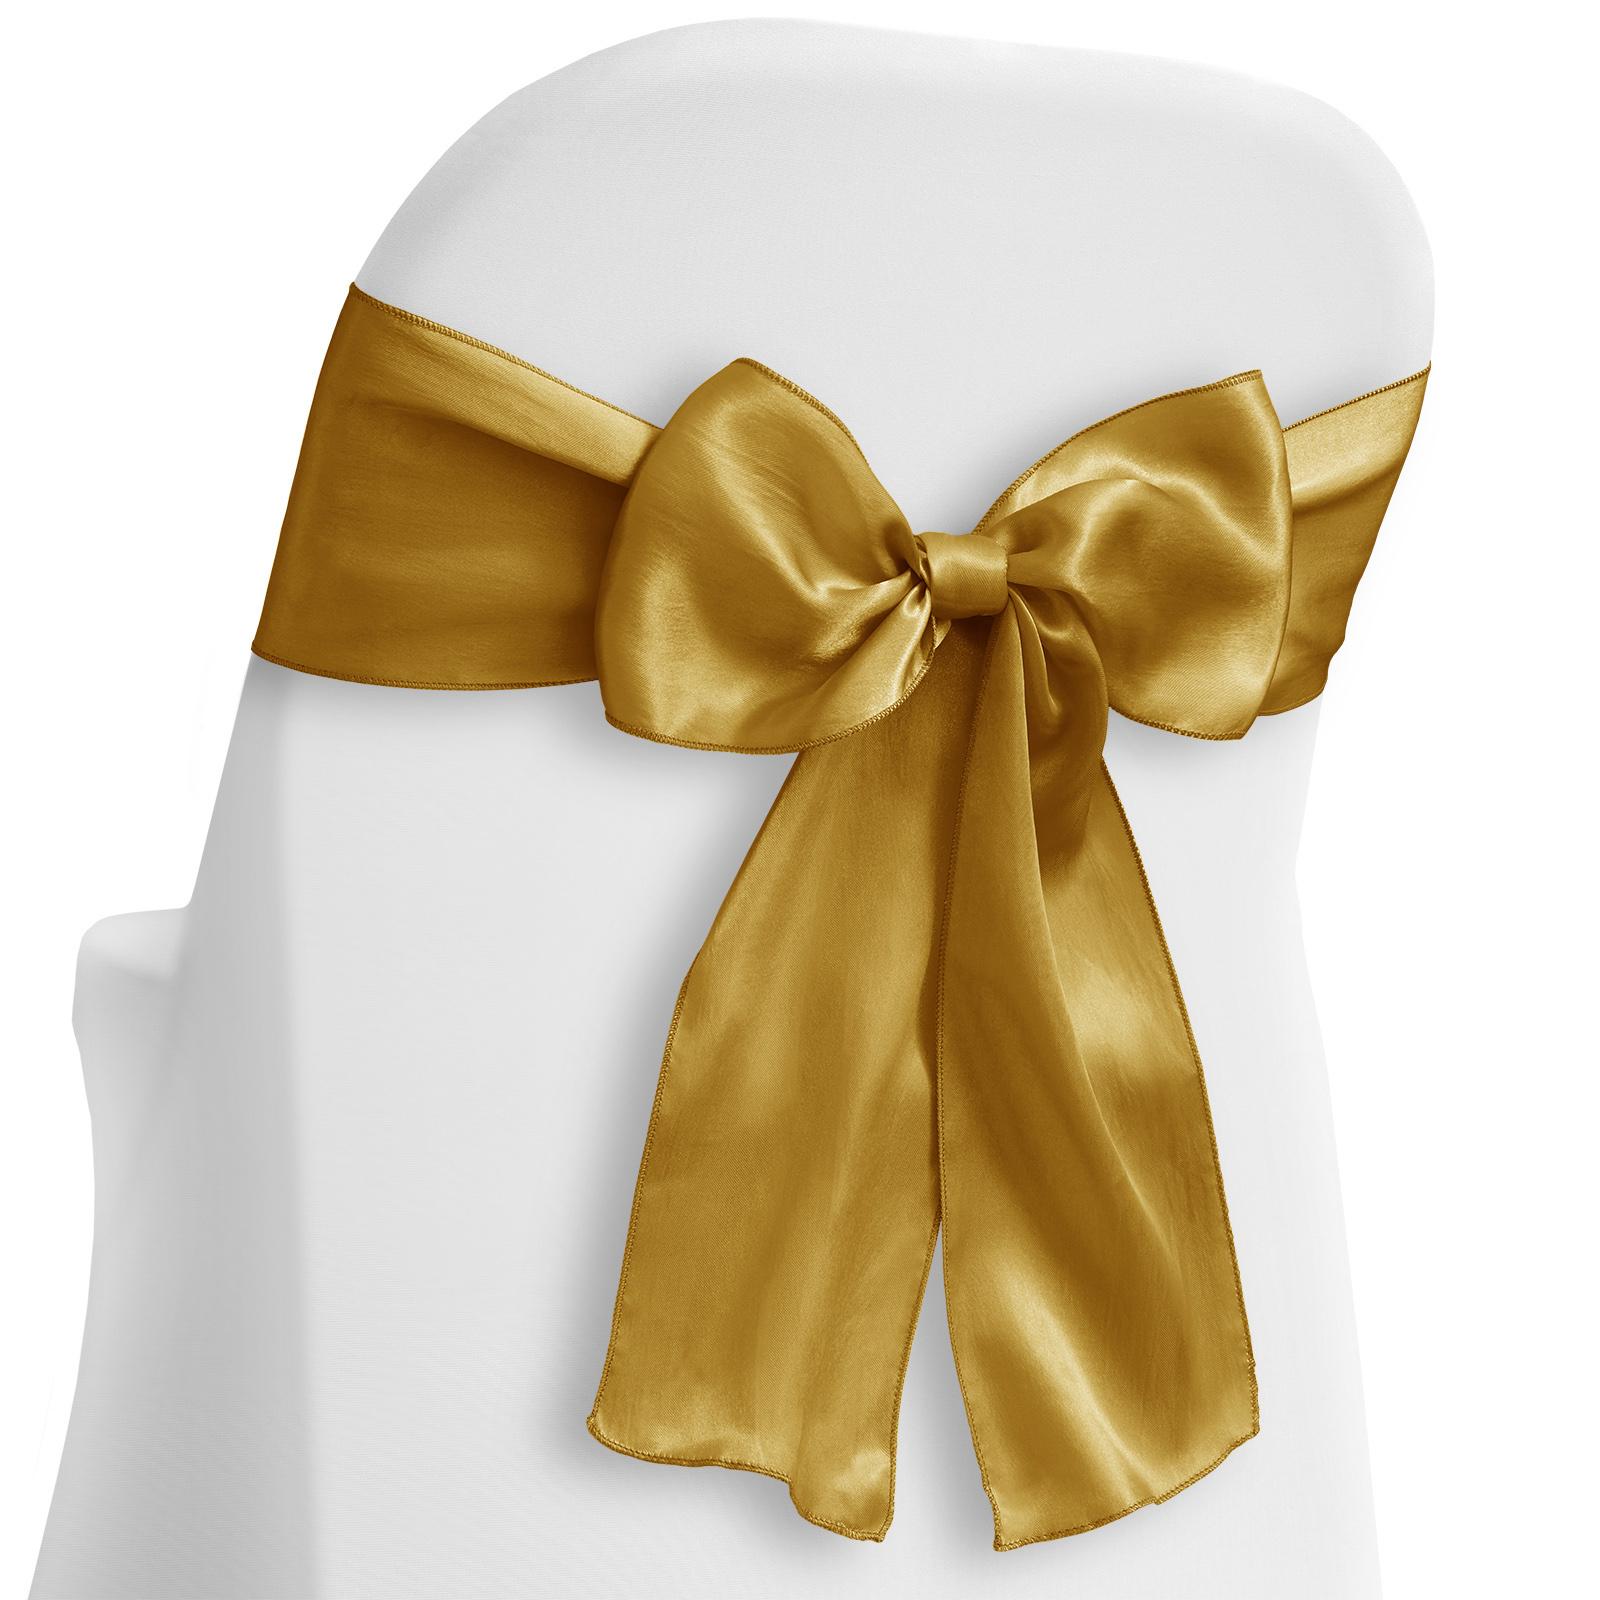 Lann S Linens 10 Elegant Satin Wedding Party Chair Cover